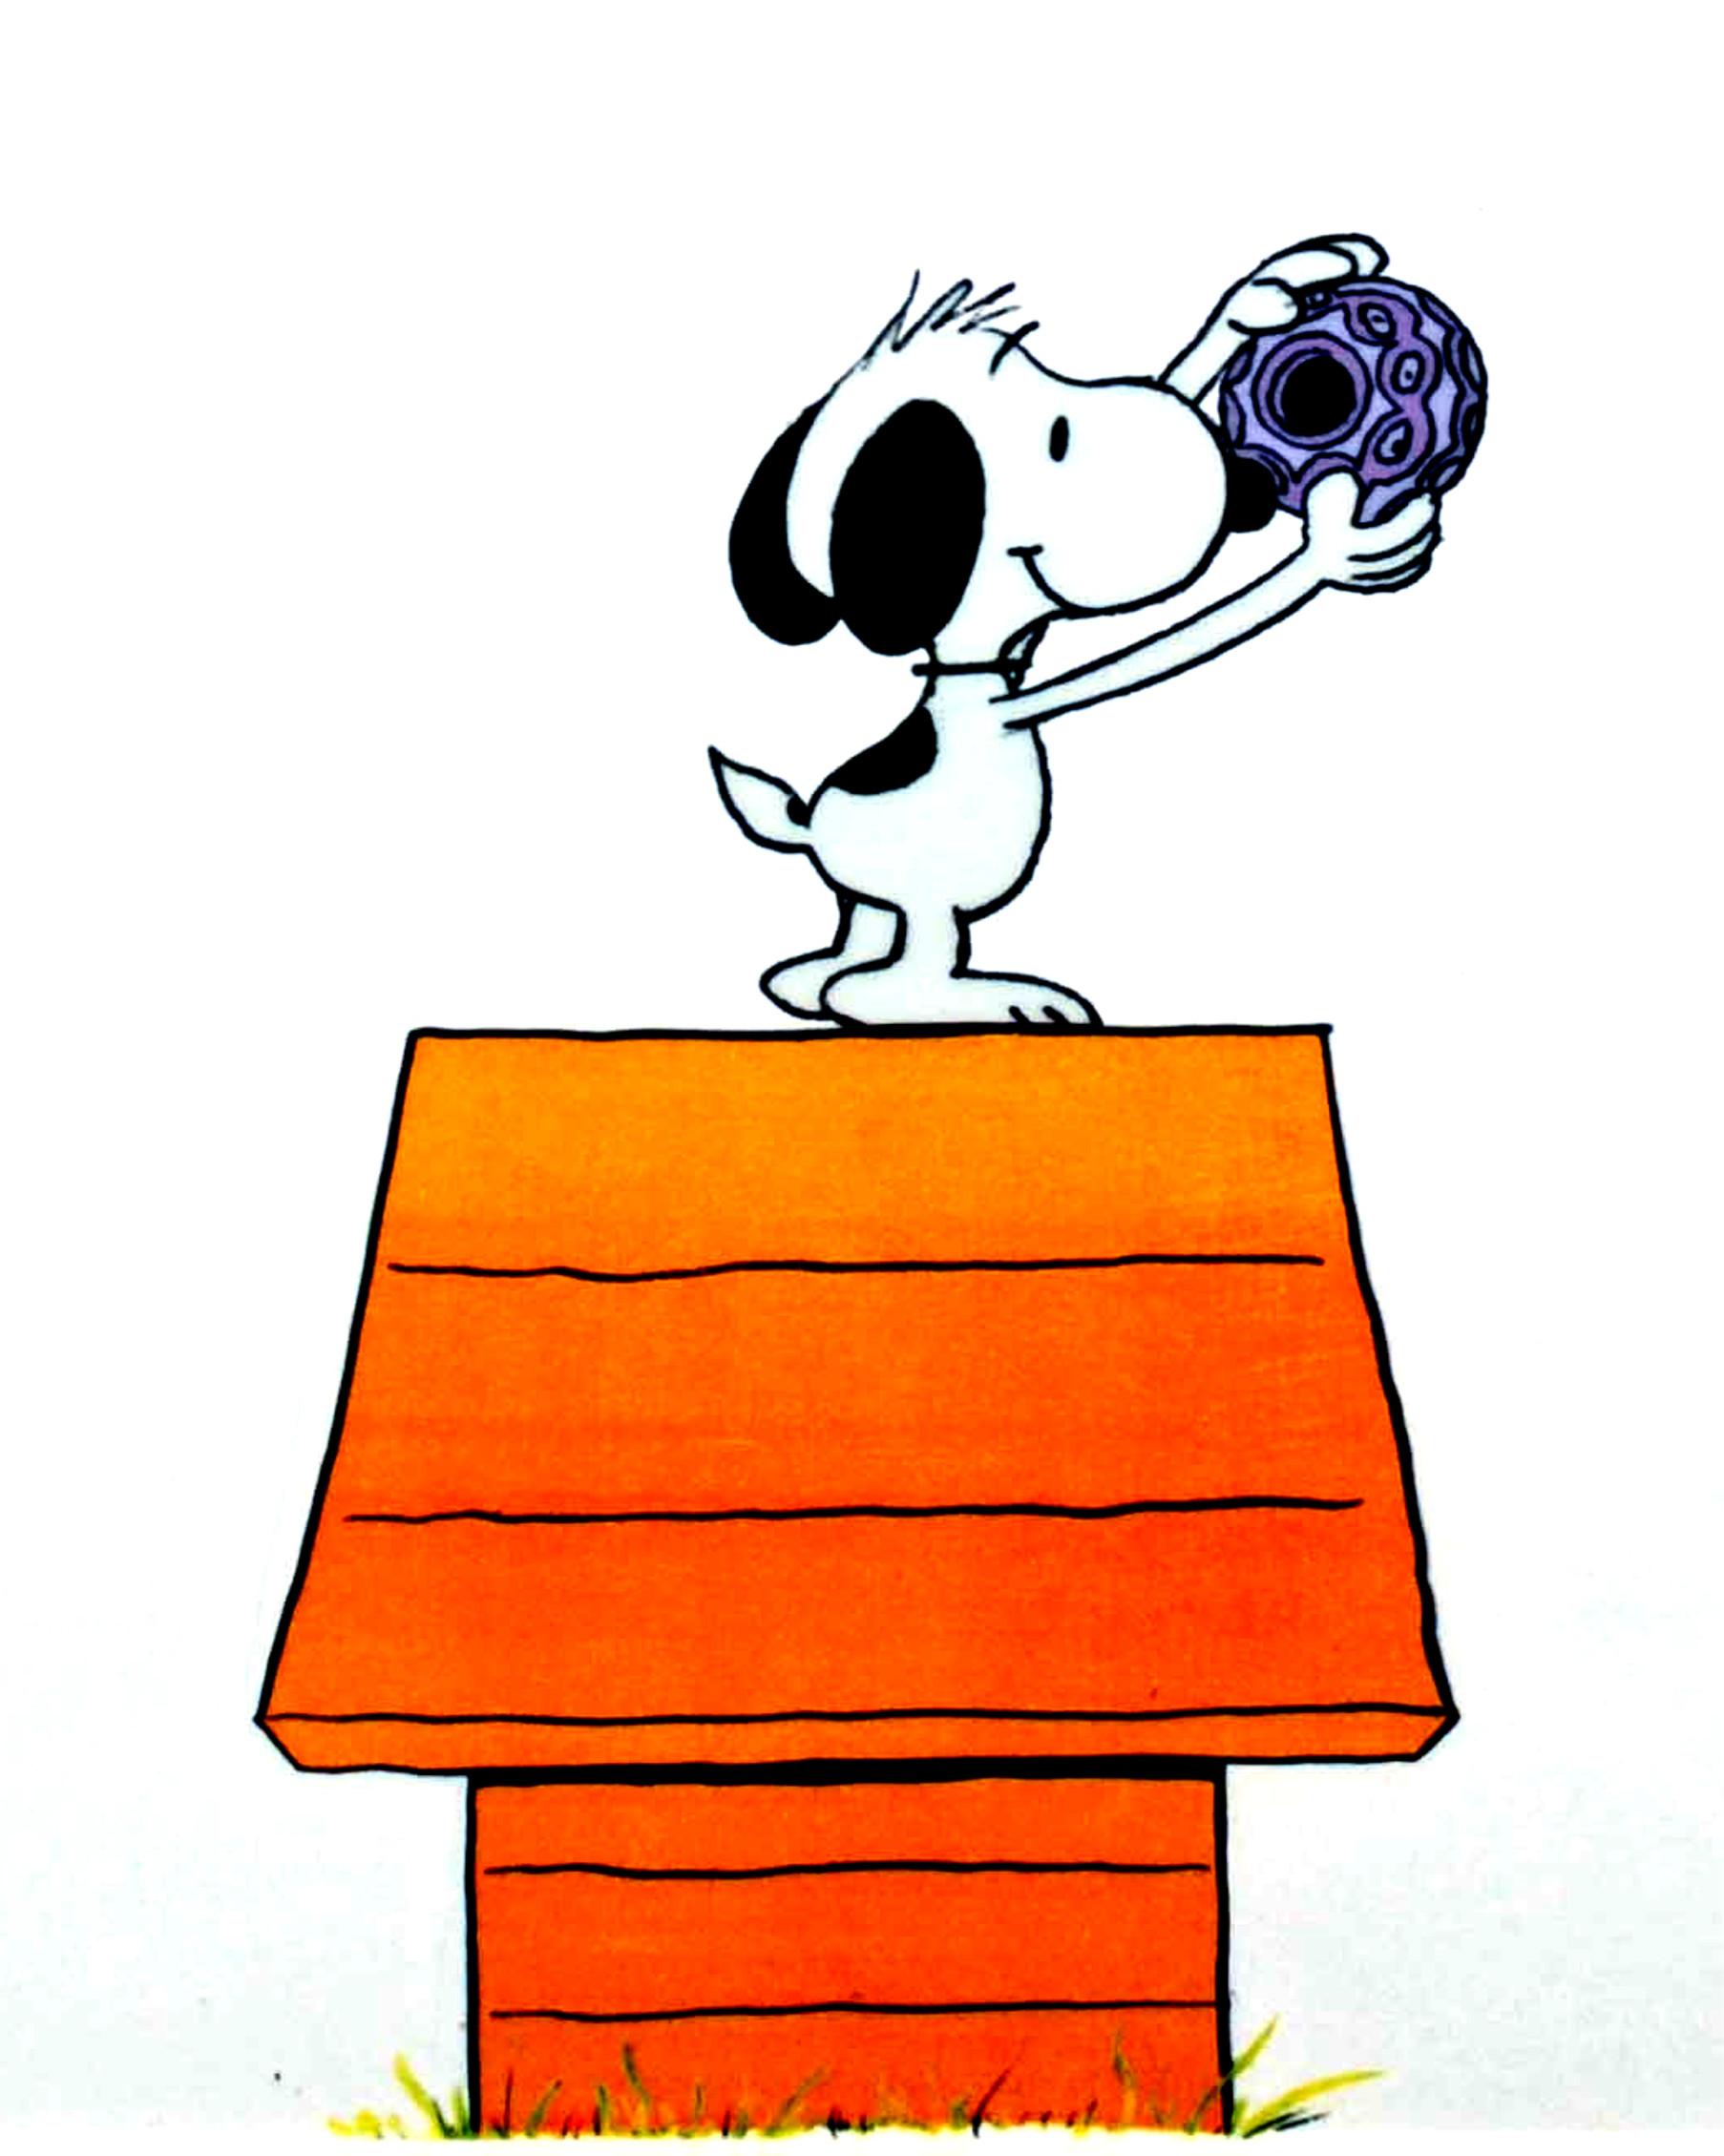 Snoopy Easter Beagle by BradSnoopy97 Snoopy Easter Beagle by BradSnoopy97